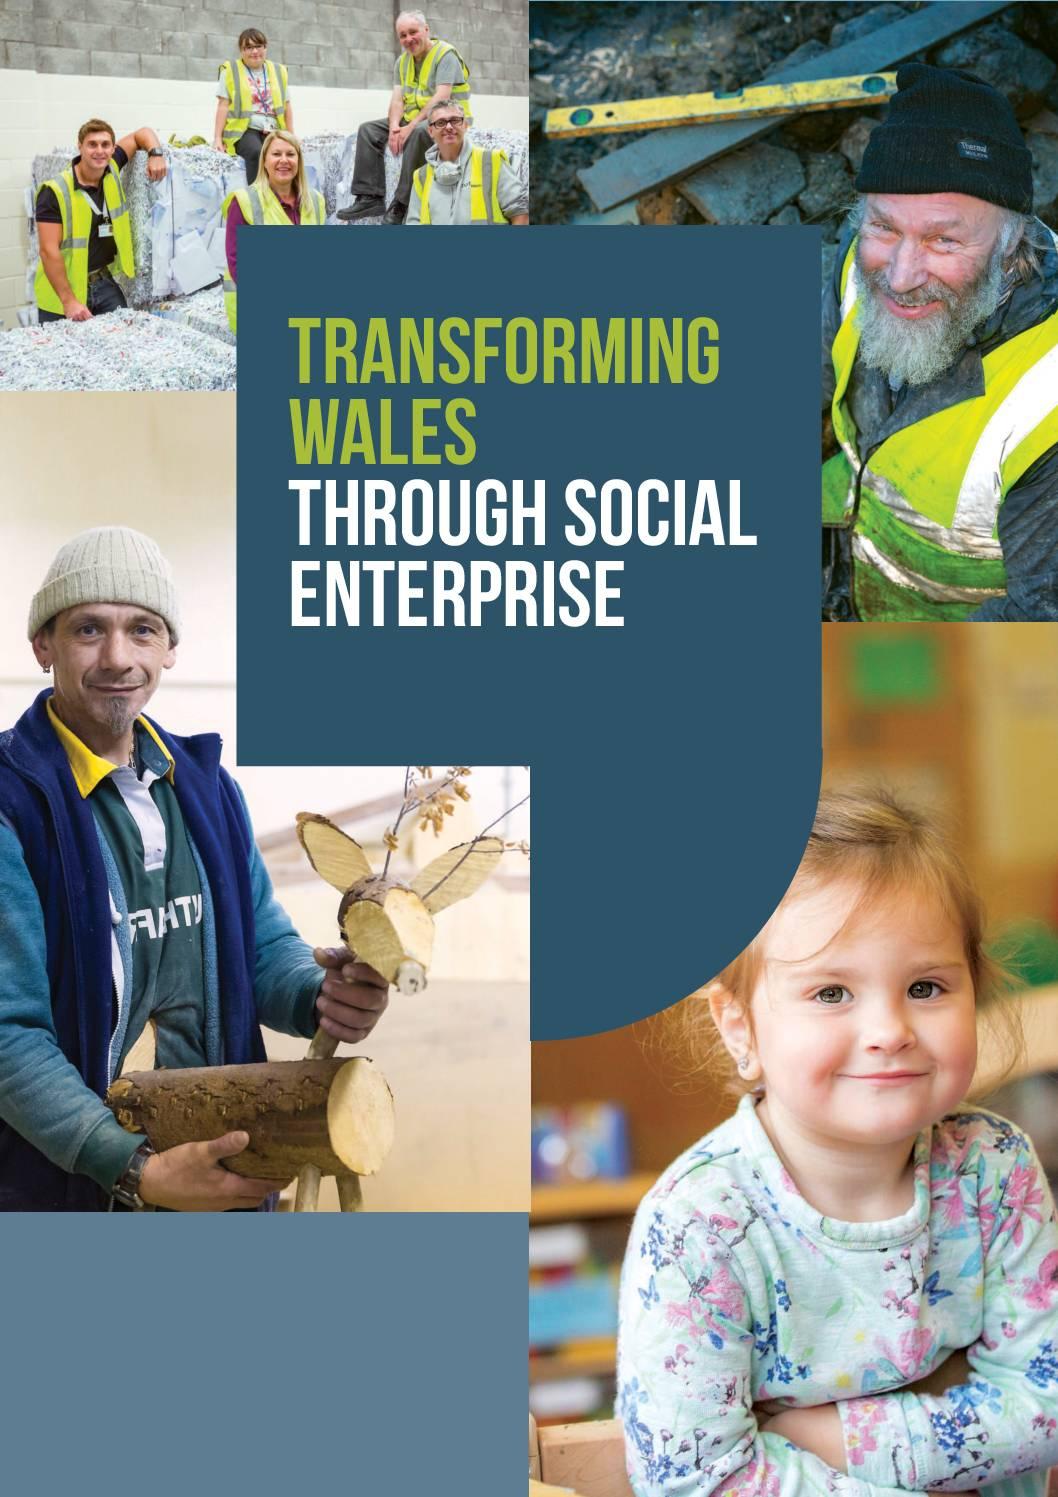 Transforming Wales through Social Enterprise: 10-Year Vision and Action Plan